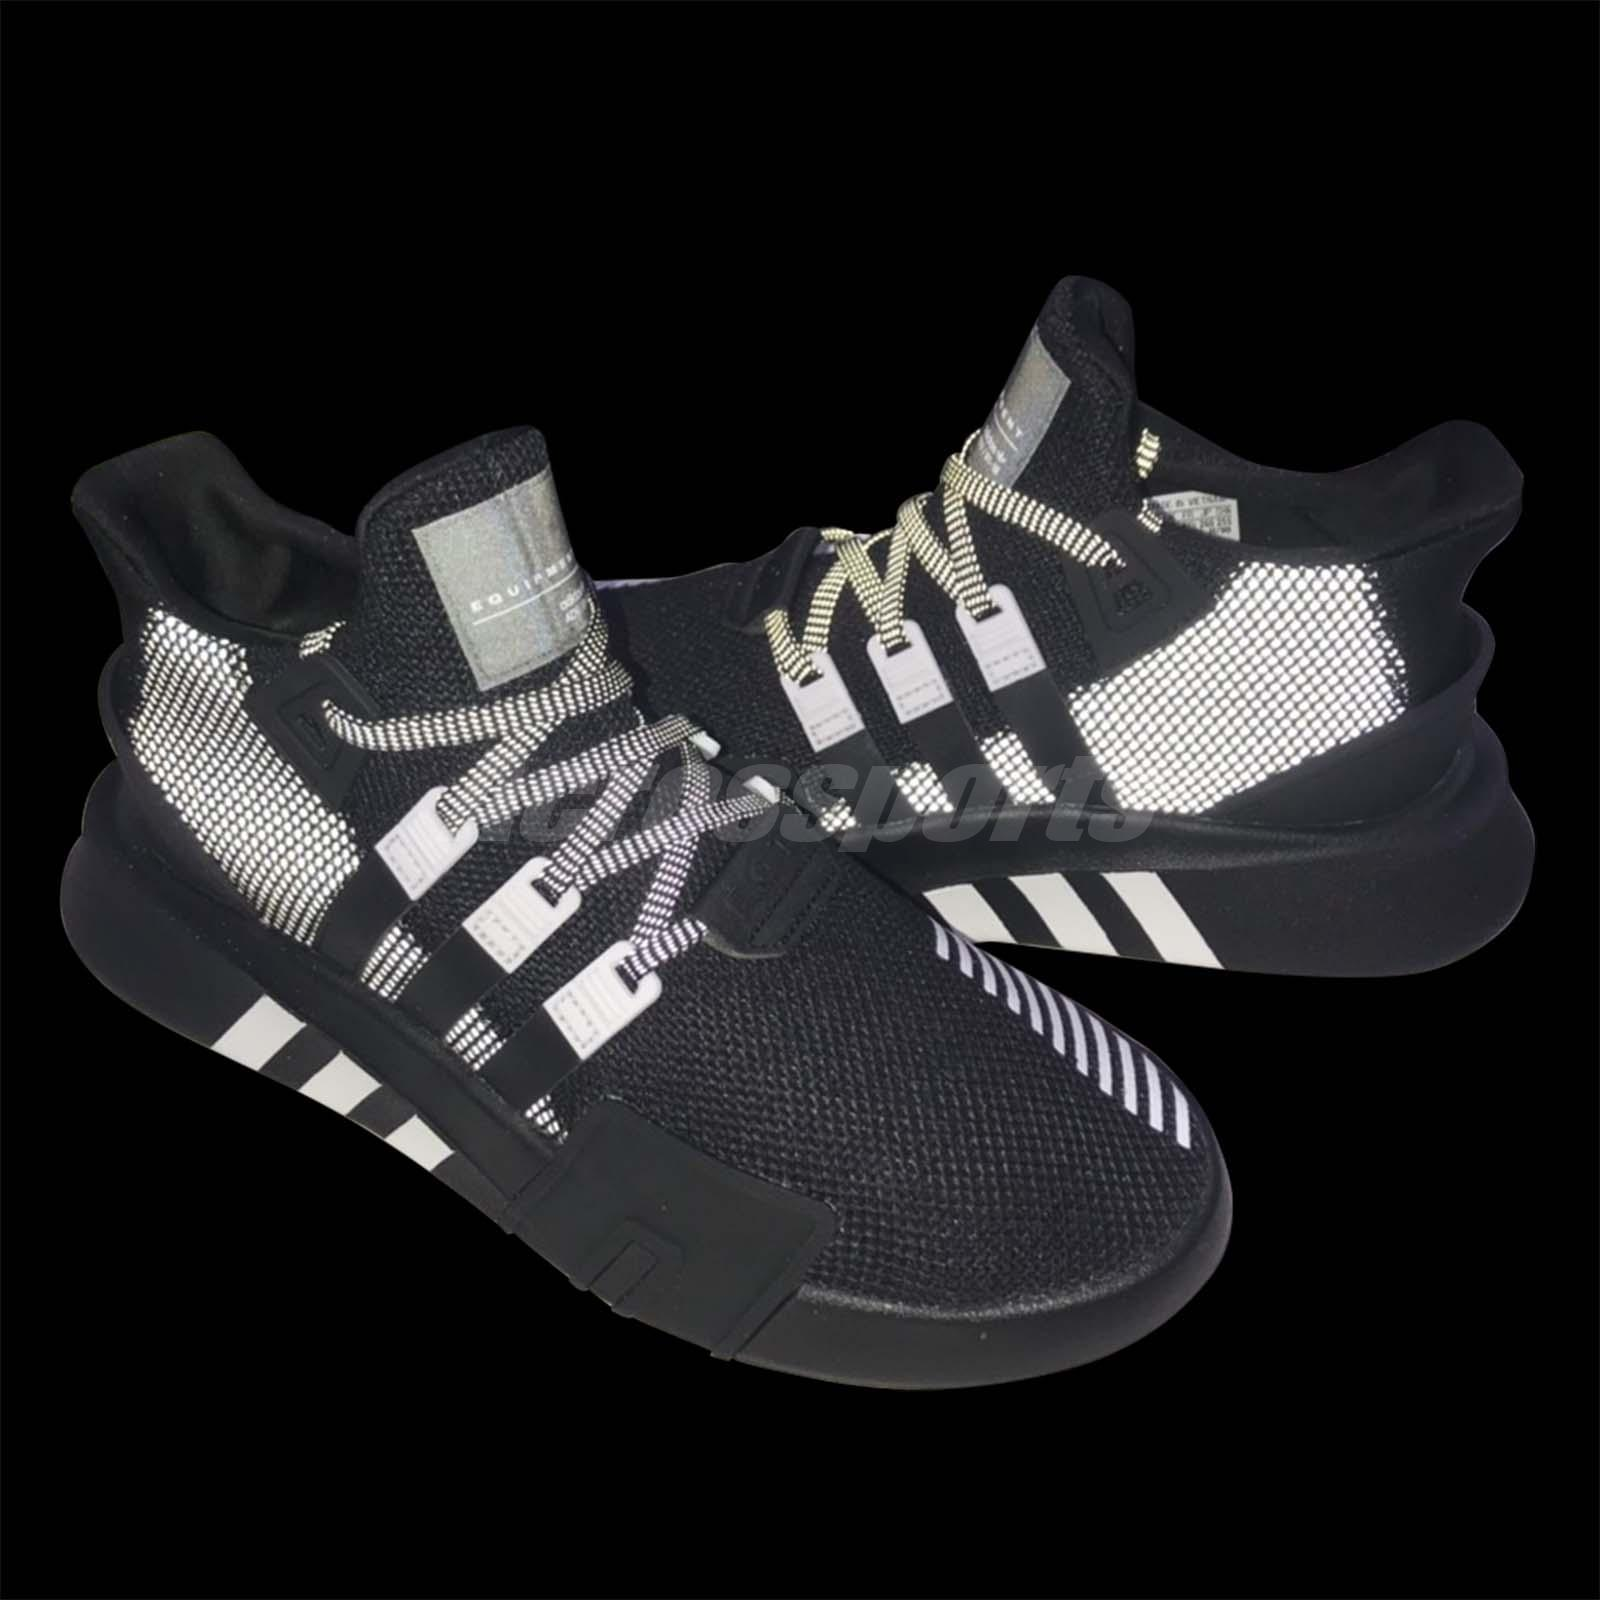 ADIDAS ORIGINALS EQT Bask ADV Herren Sneaker BD7773 Schwarz